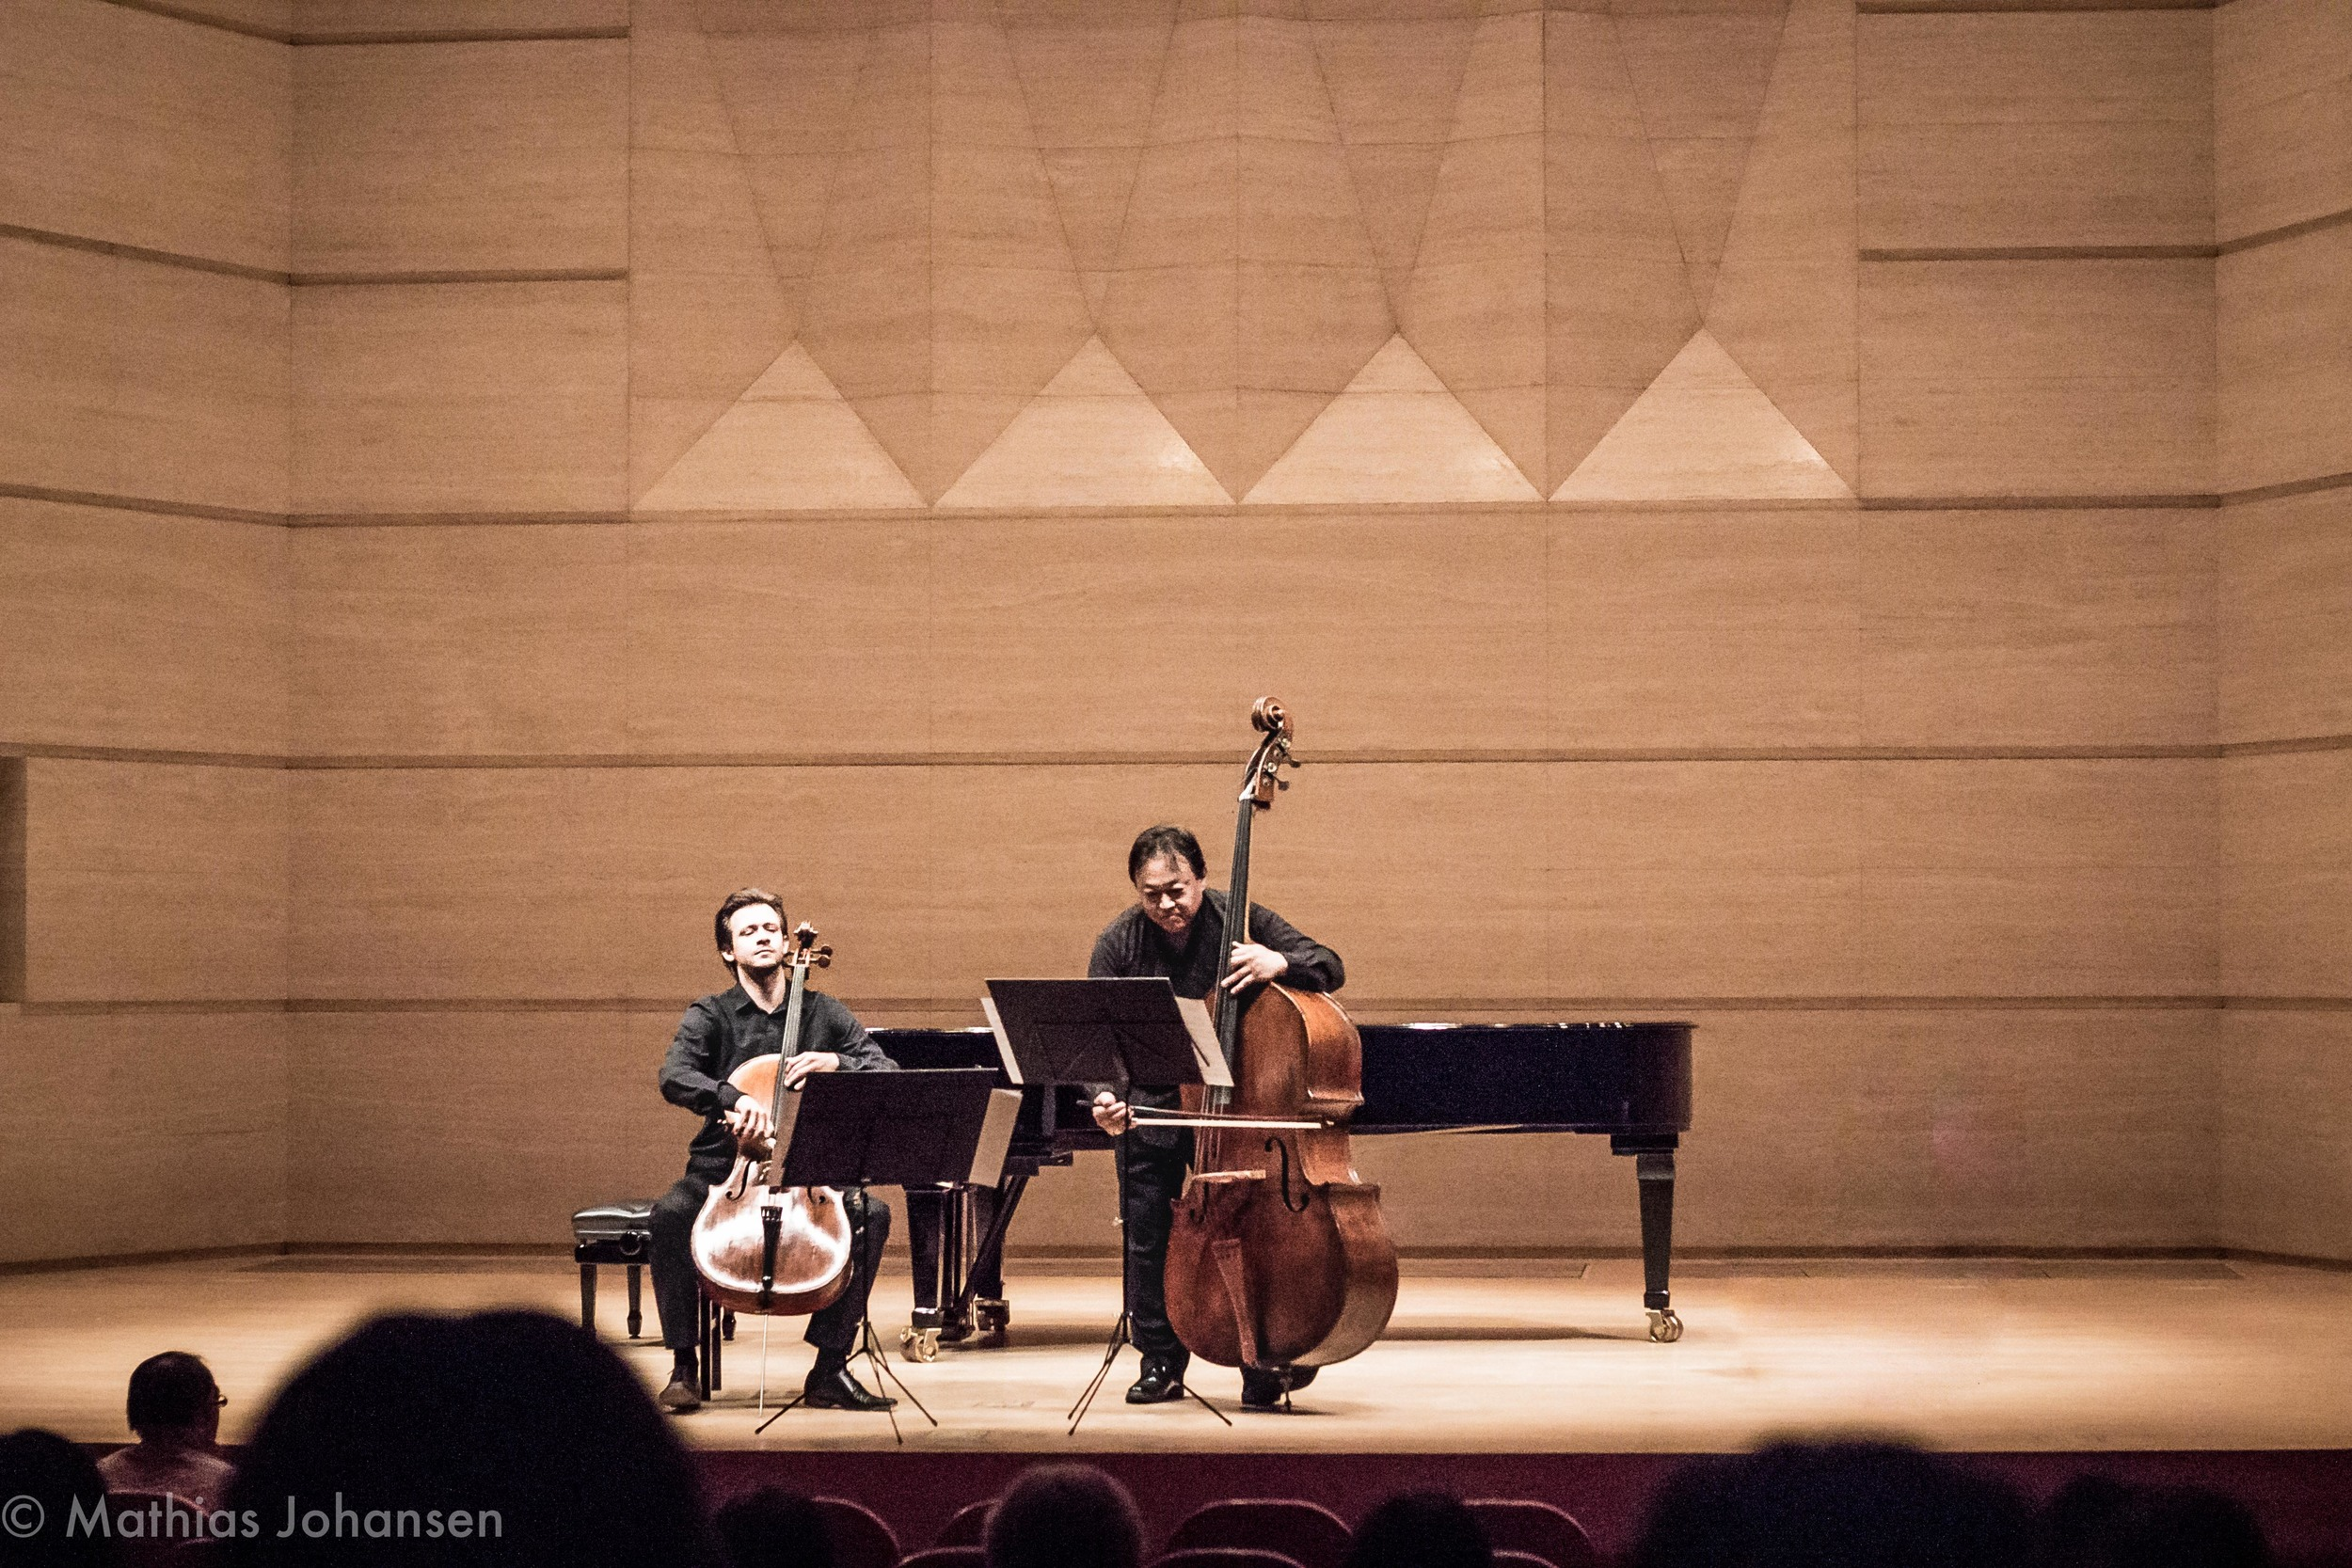 Masters Concert in Nagoya